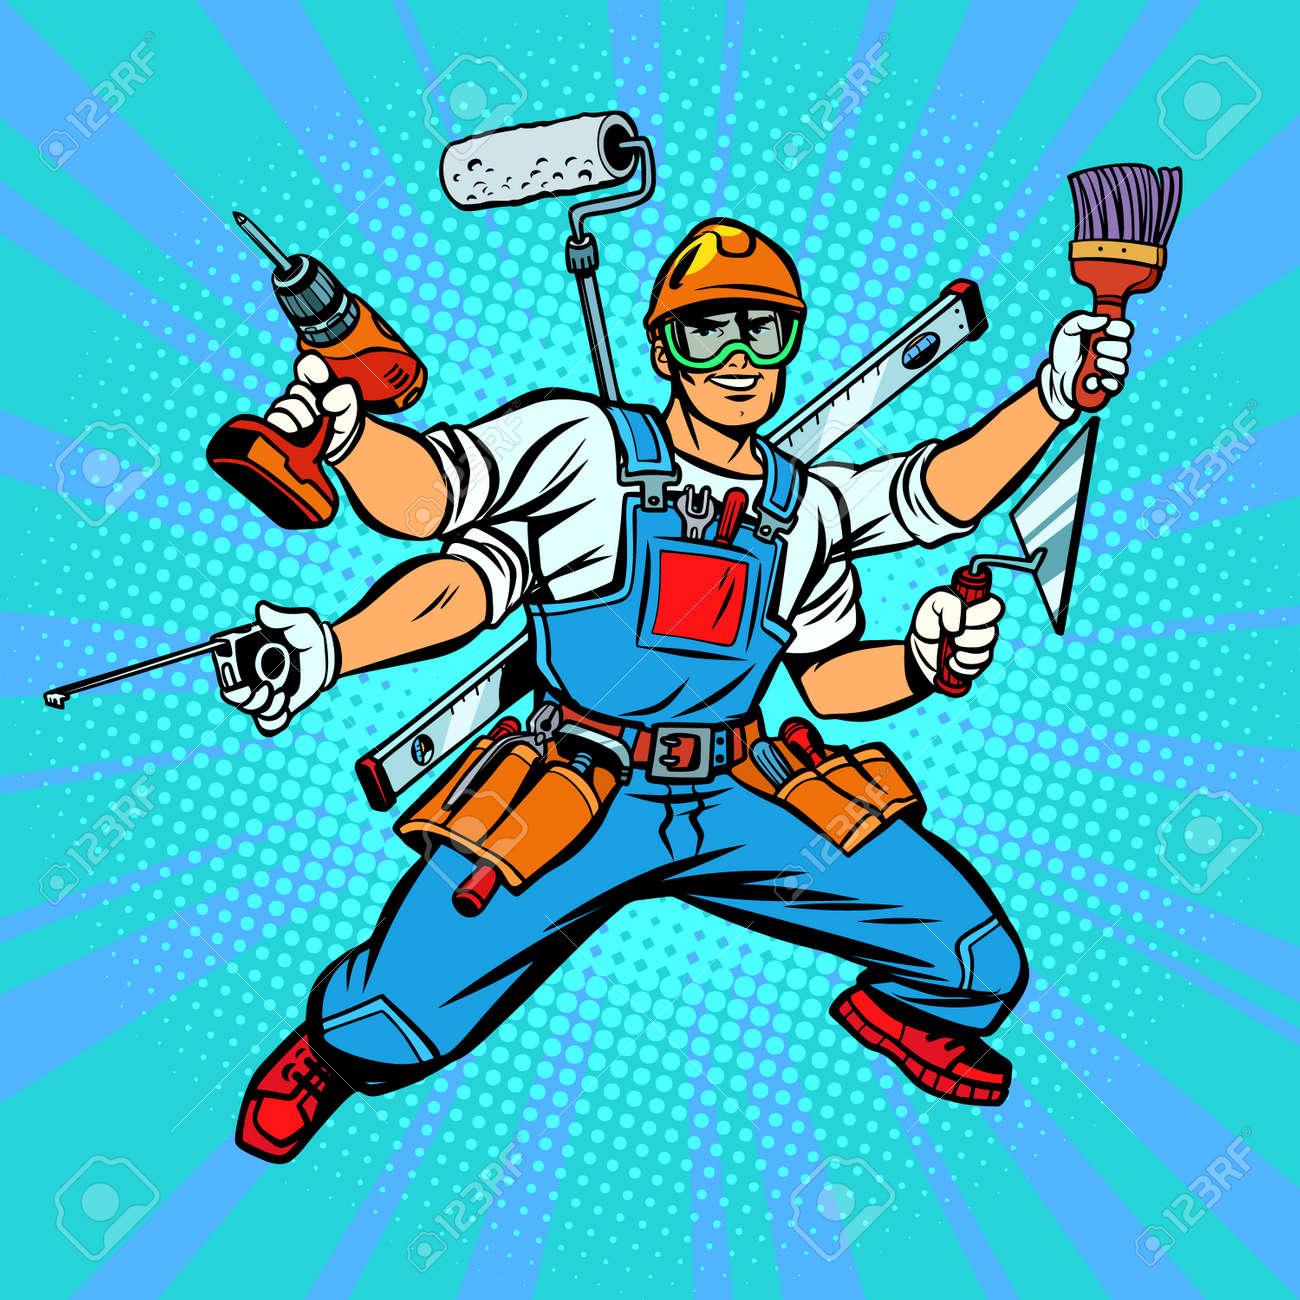 Many hand Builder repairman worker - 104790708